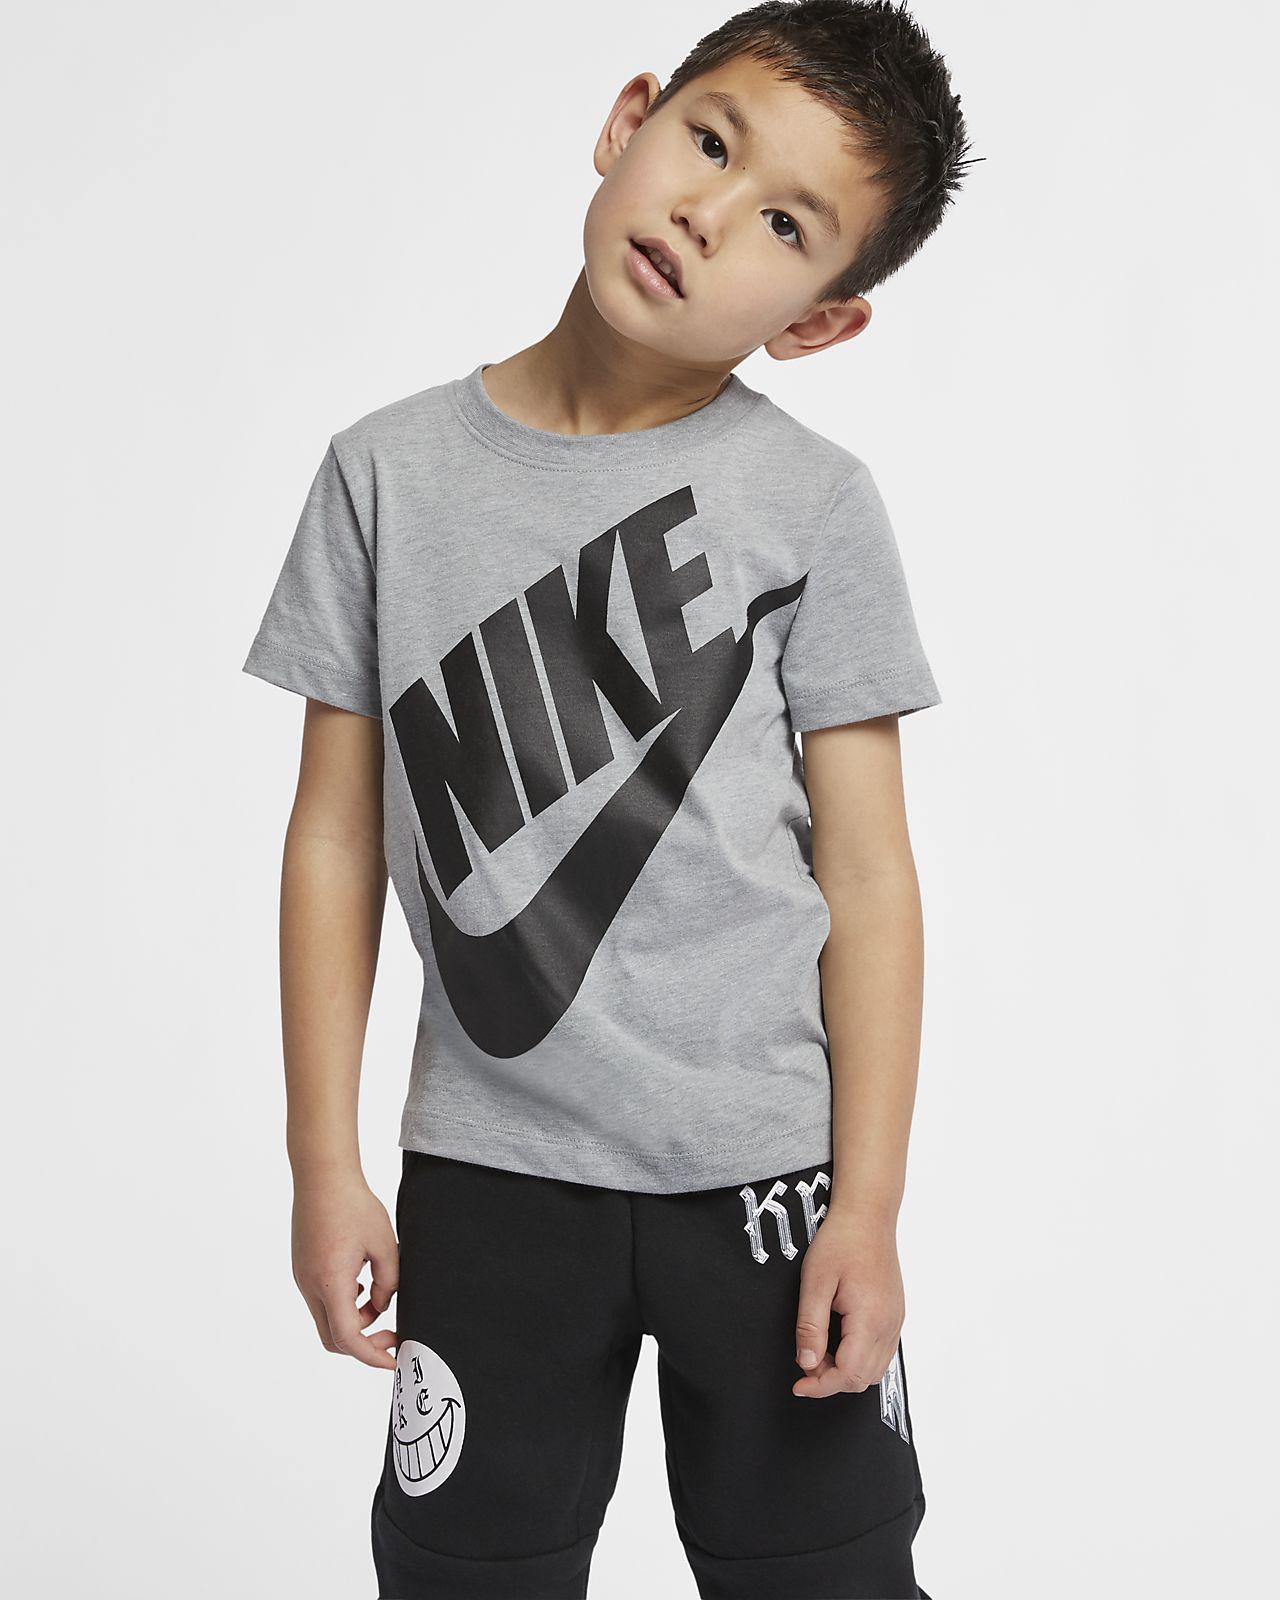 Nike Sportswear Younger Kids' T-Shirt